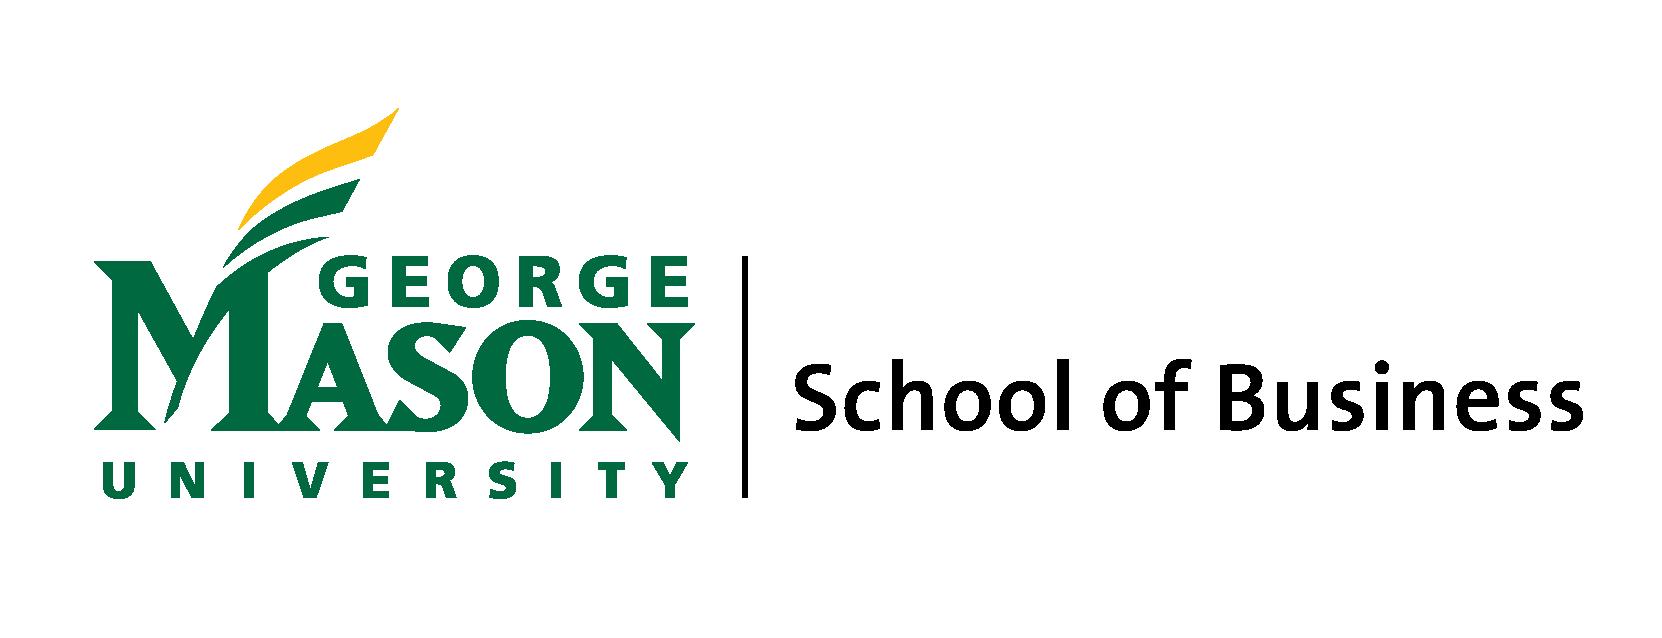 George Mason University School of Business